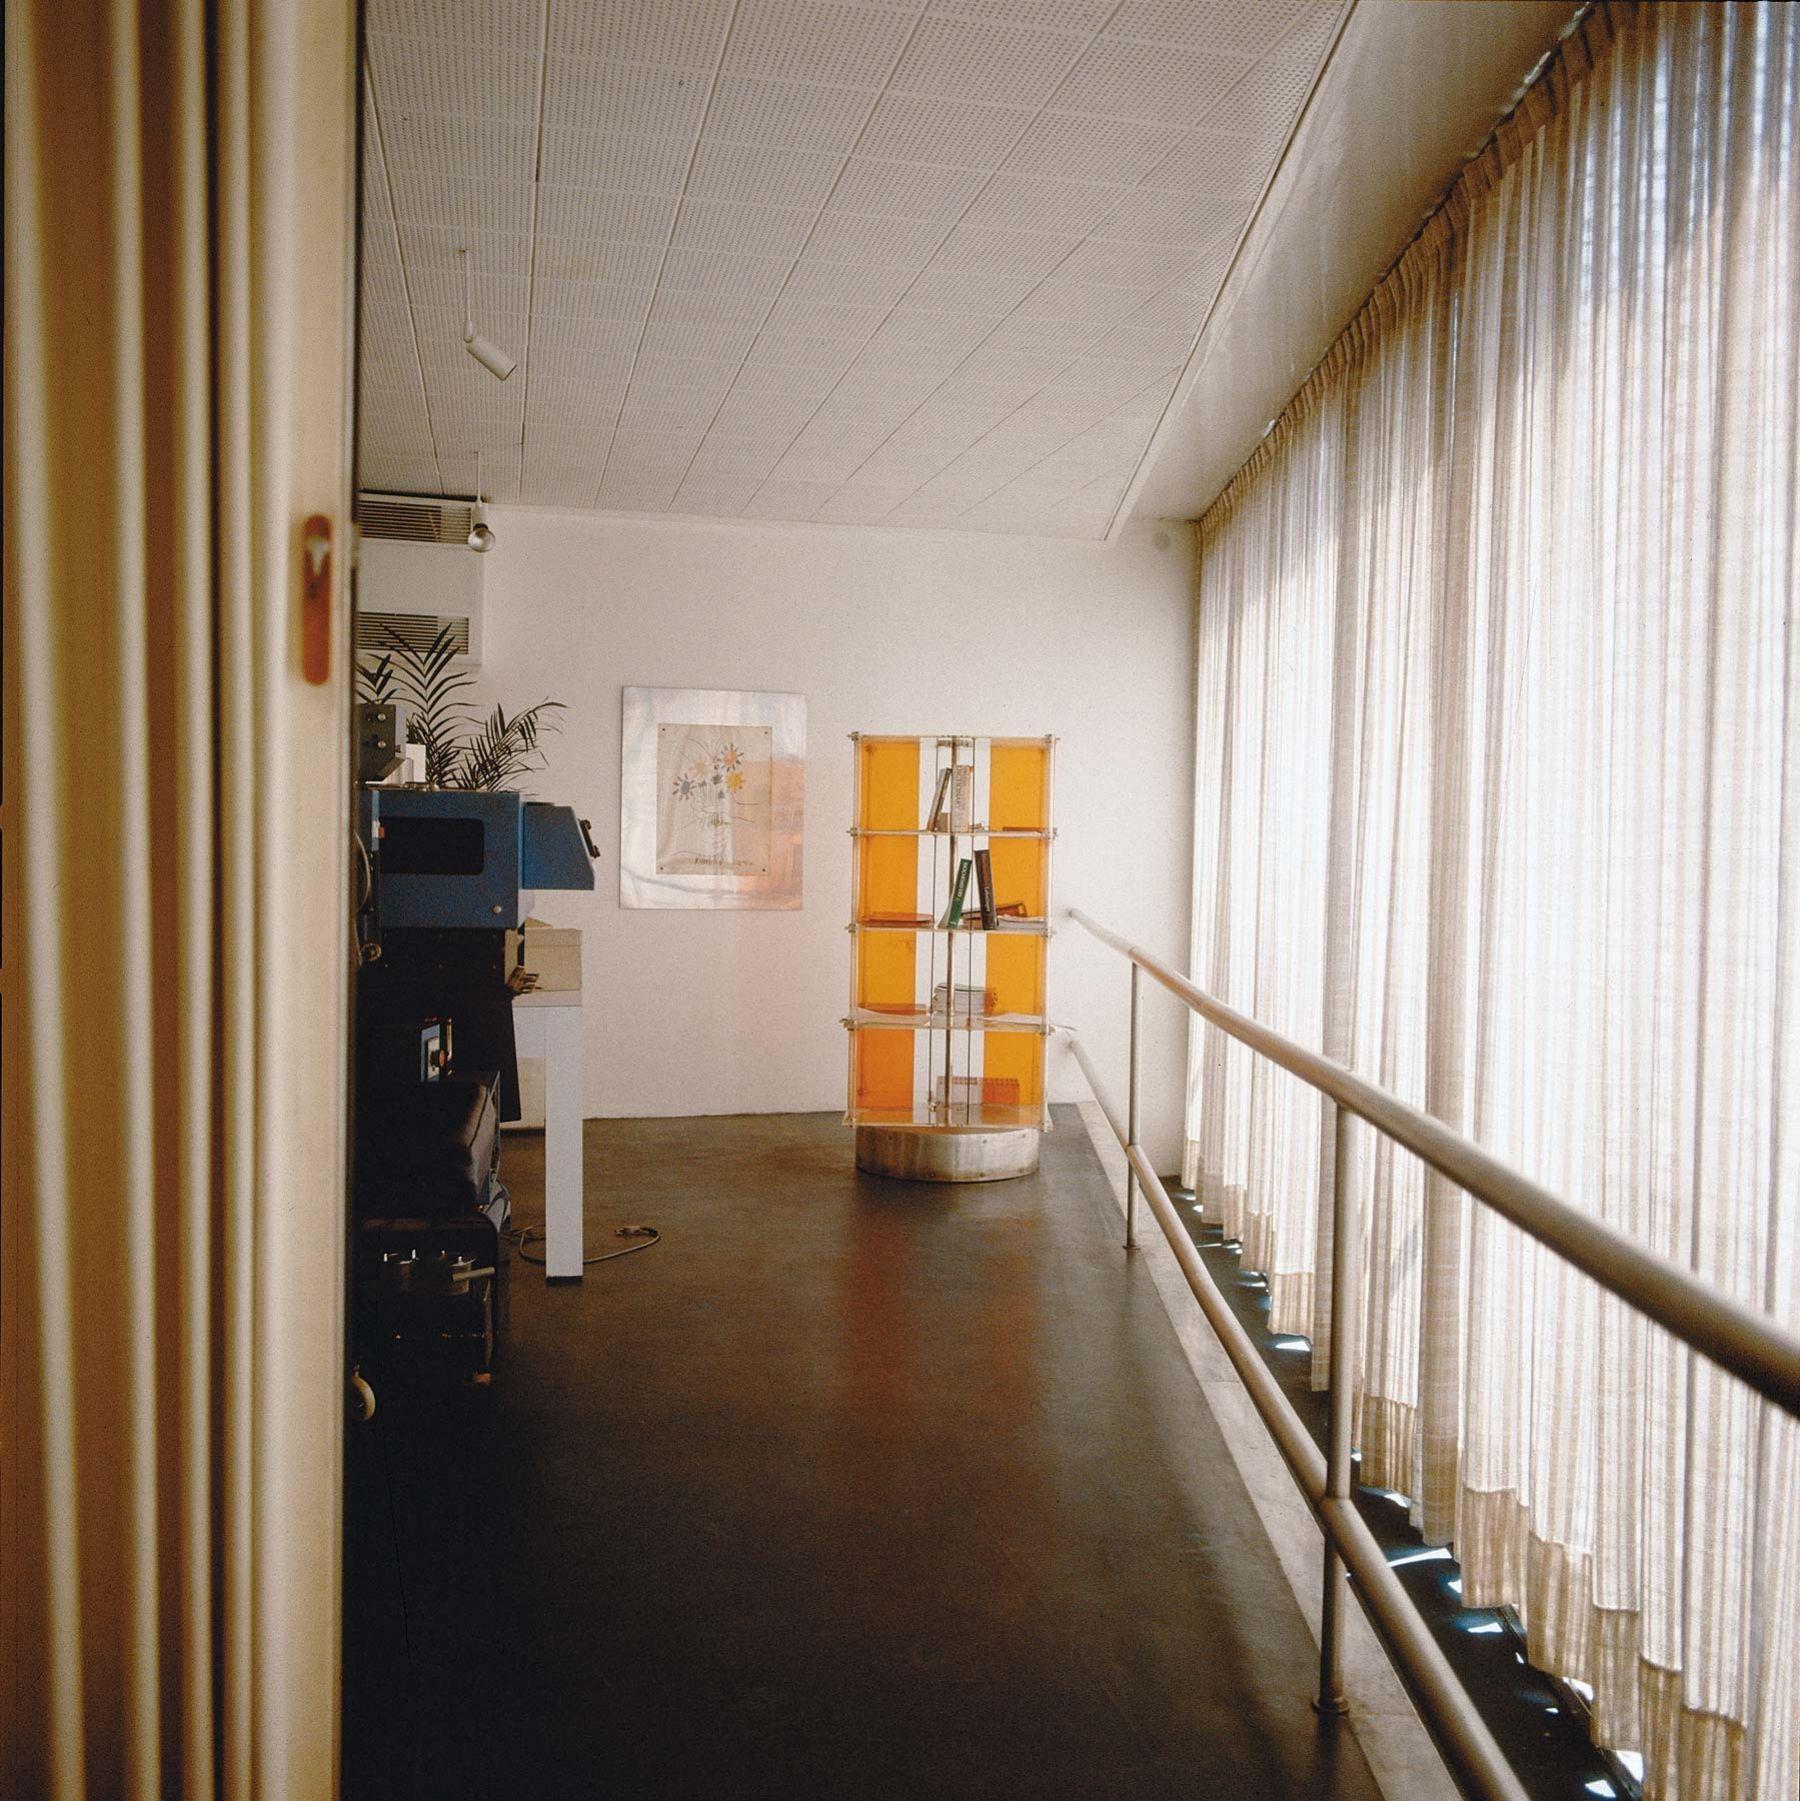 Laboratorio en calle Juncal